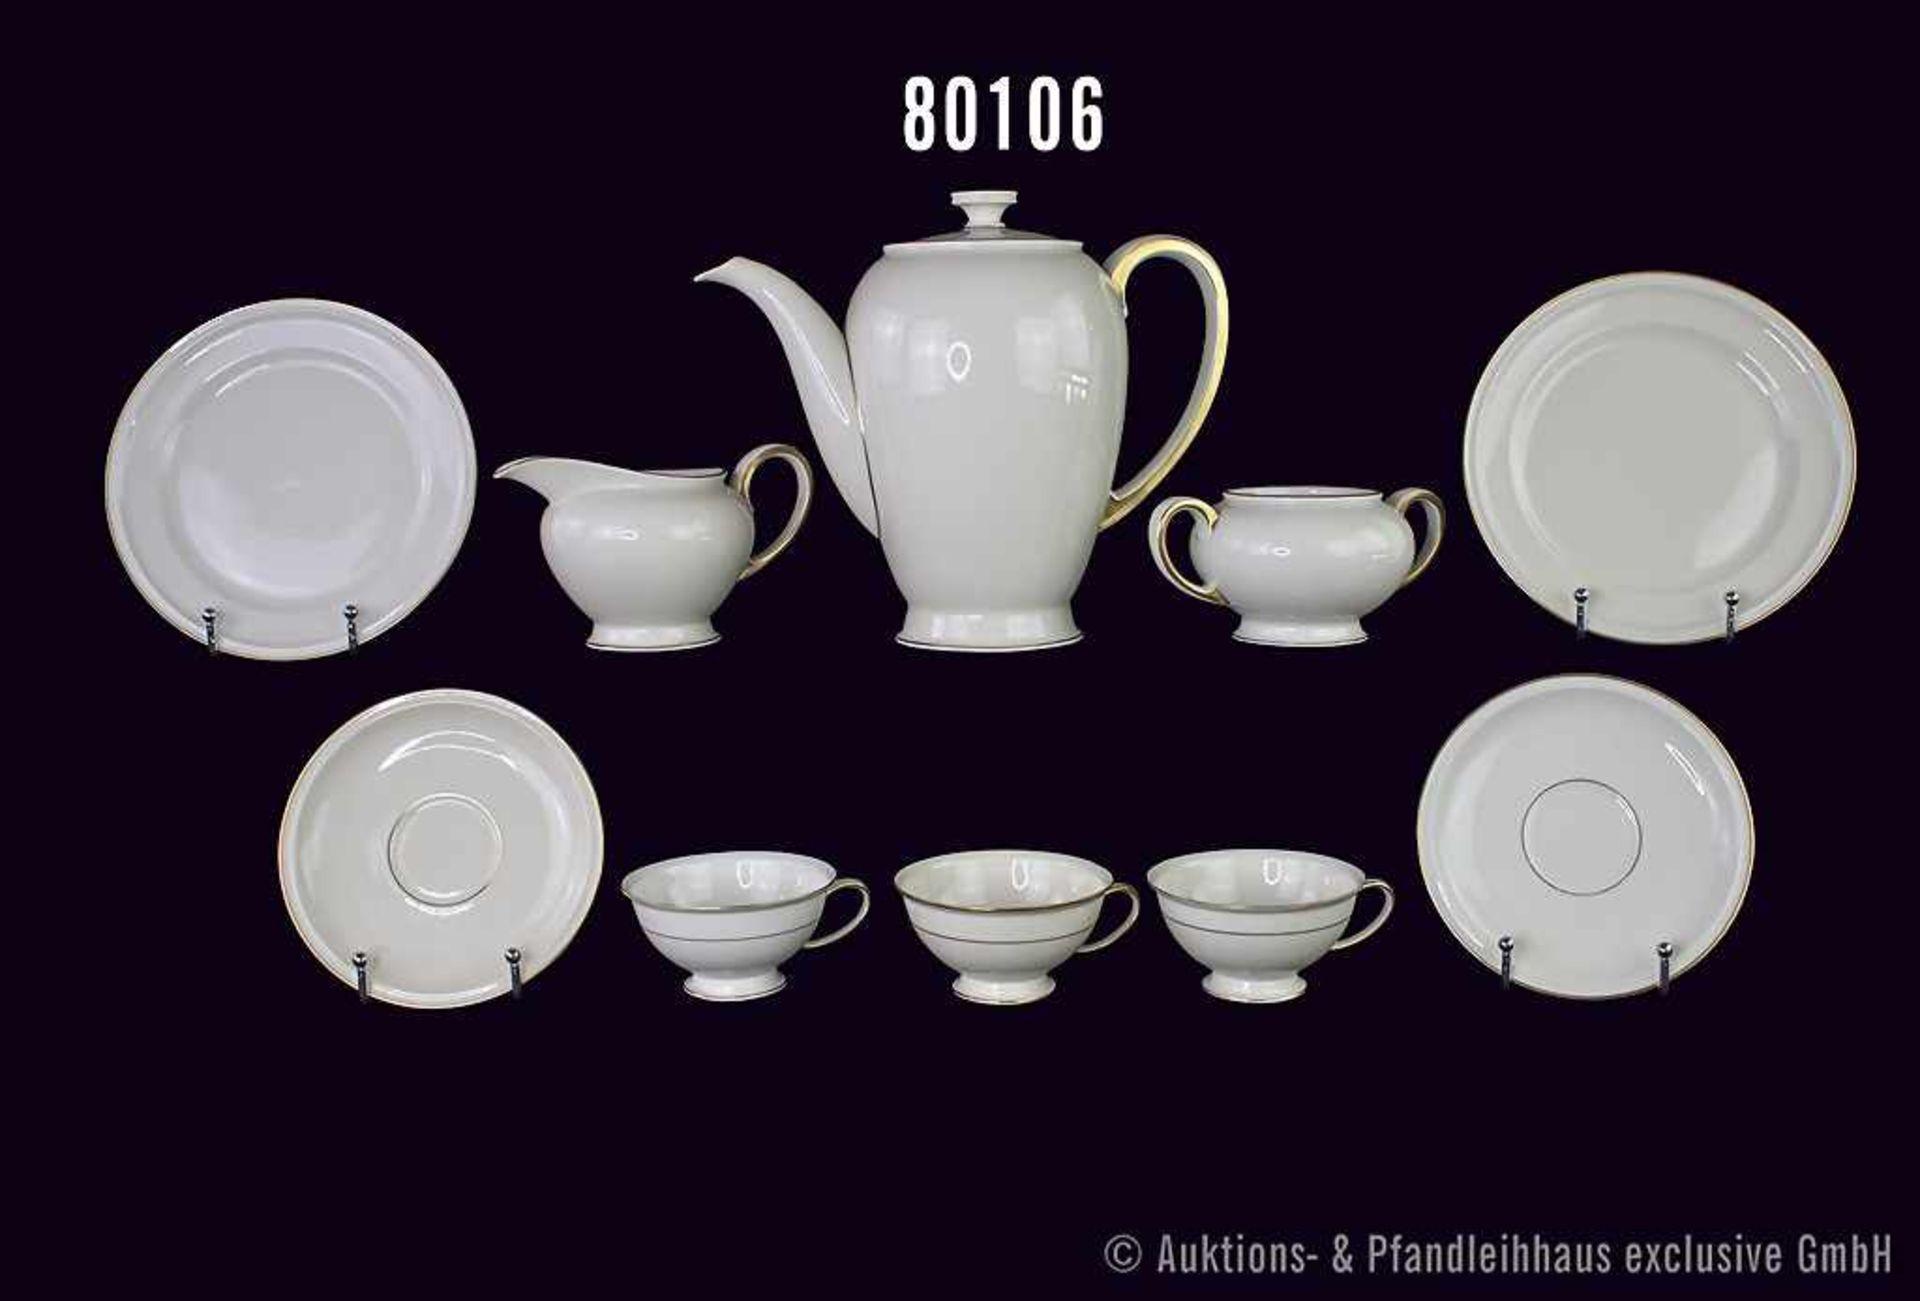 "Konv. 49 Teile Rosenthal Porzellan, Motiv ""Winifred"" 1935, mit Goldrand, dabei 1 Kaffeekanne mit"